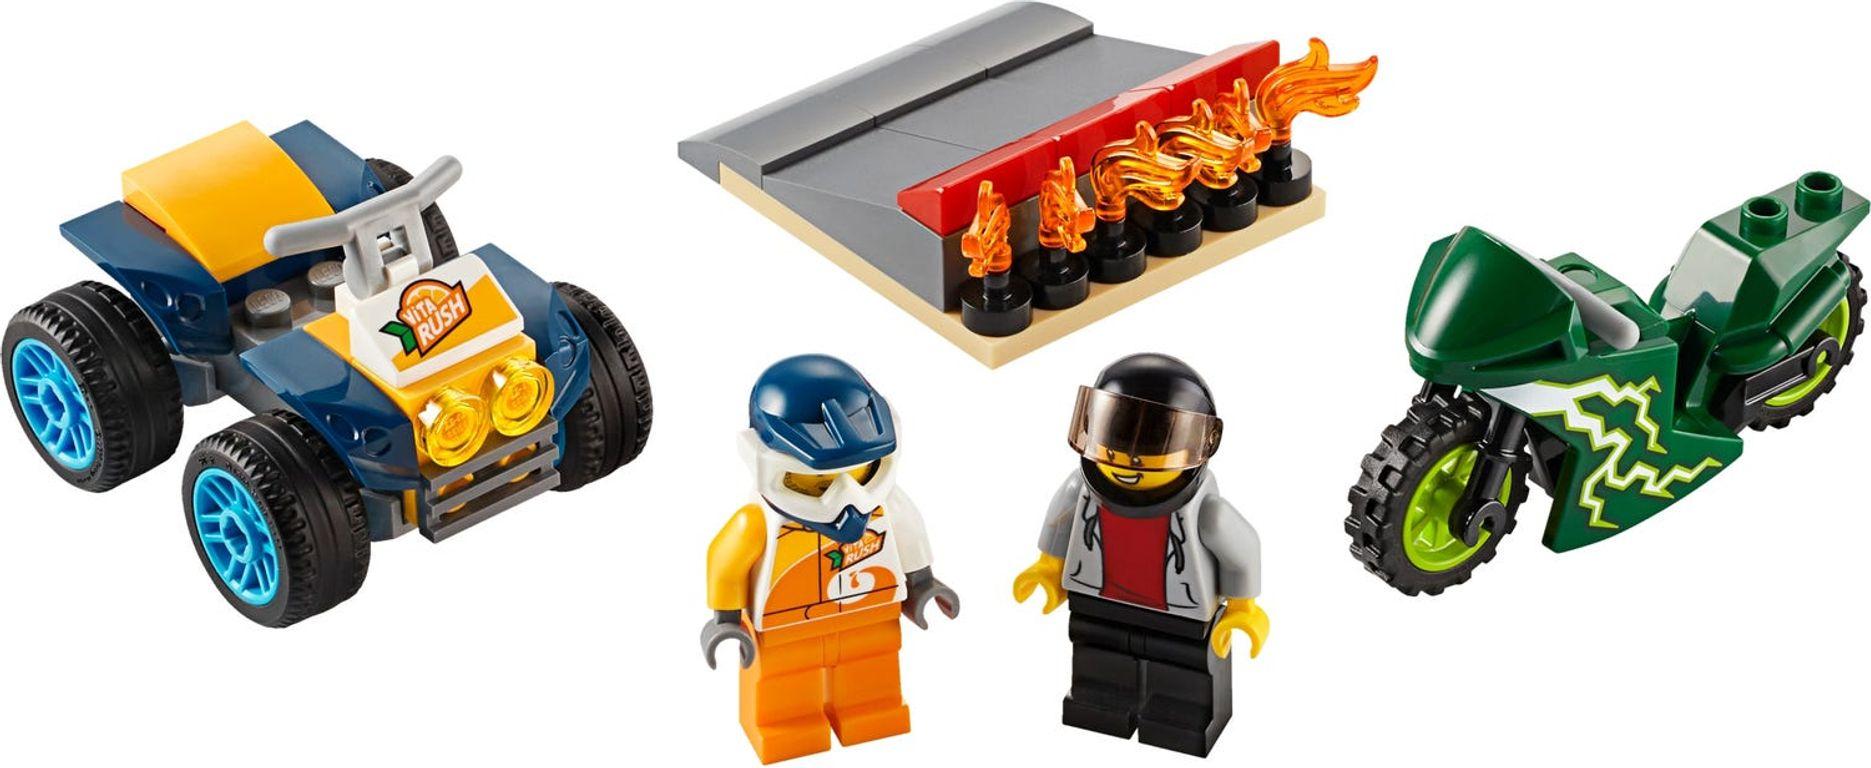 LEGO® City Stunt Team components